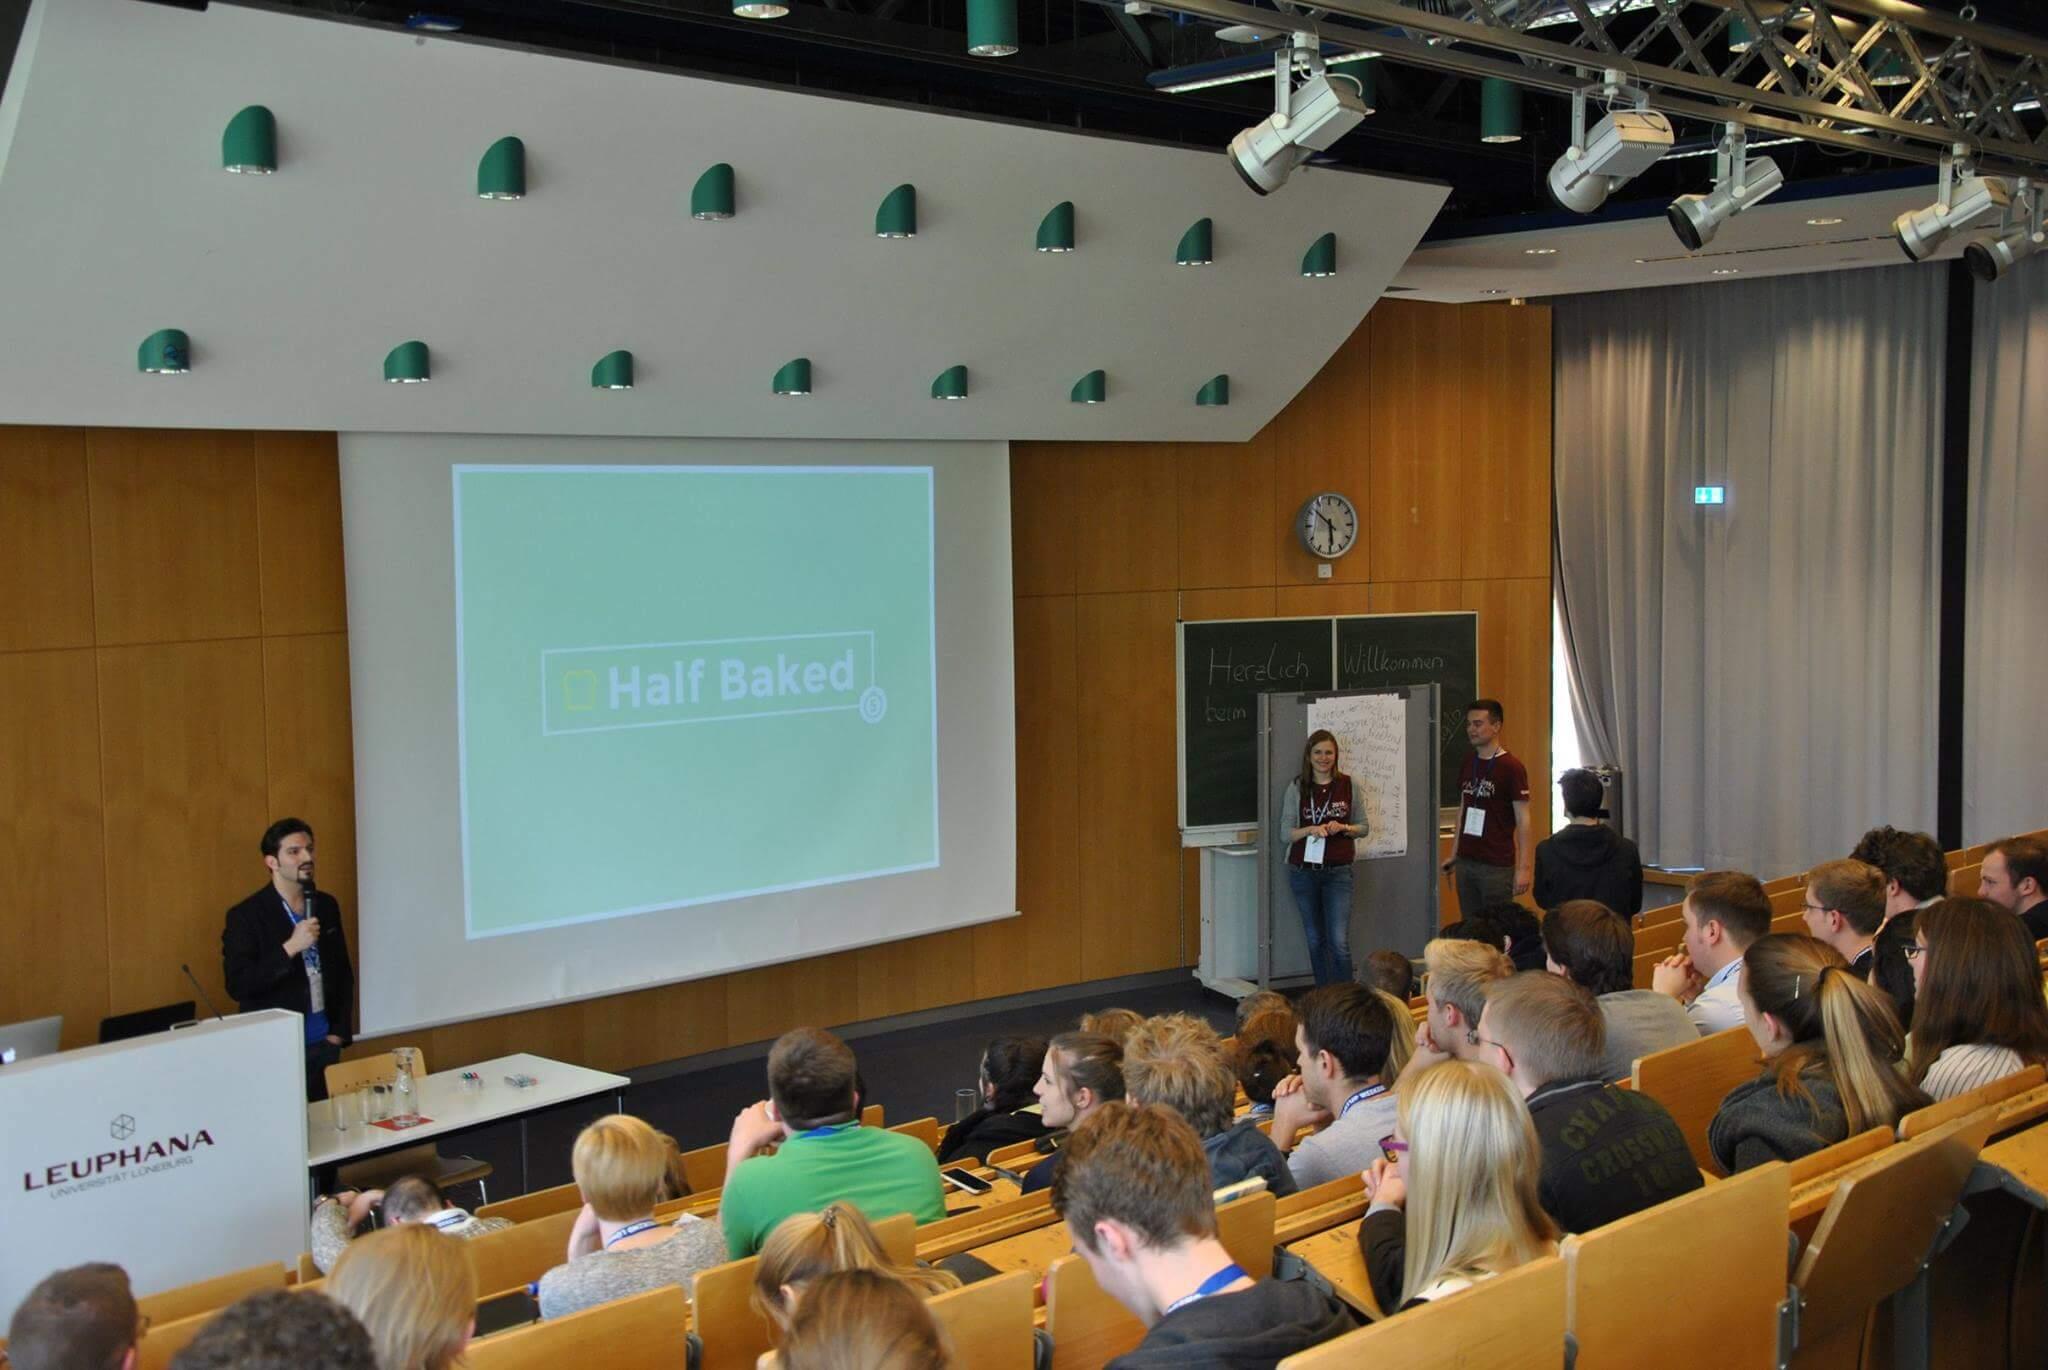 Startup Weekend Lüneburg 2016 moderated by Serhat Kaya